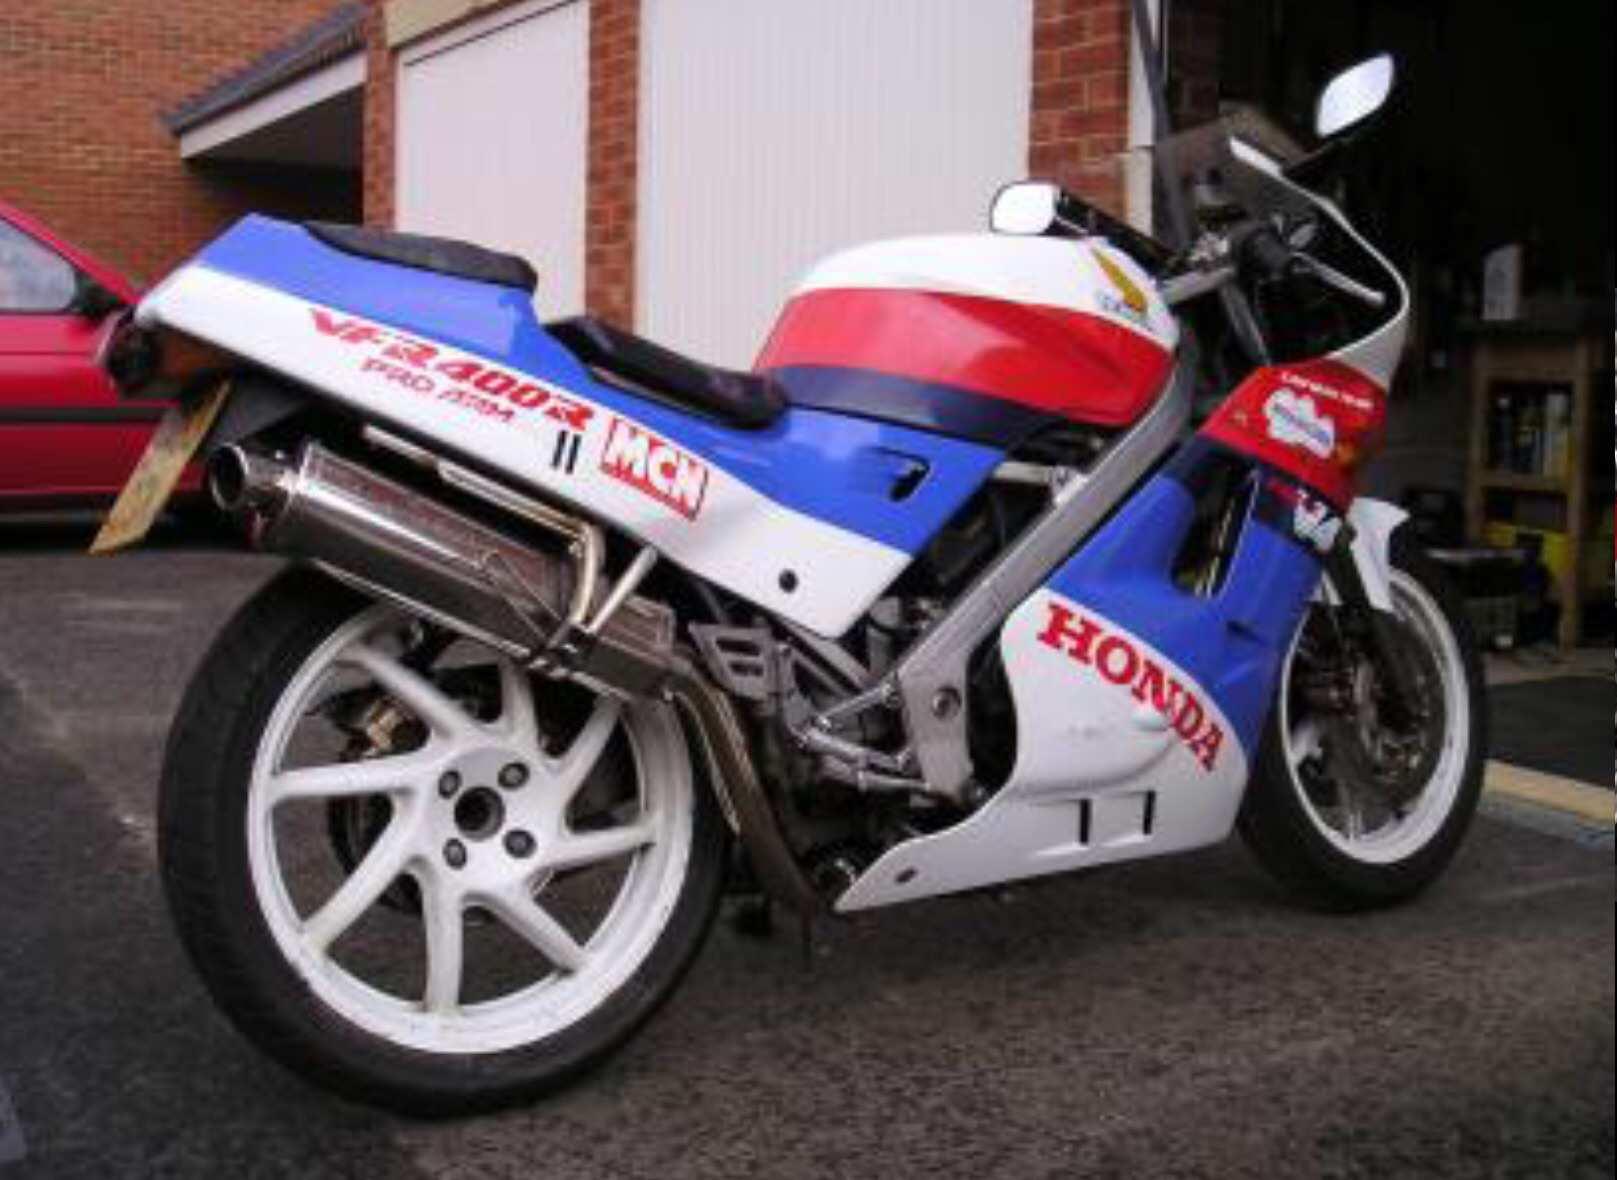 Honda VFR 400 nc24 #11